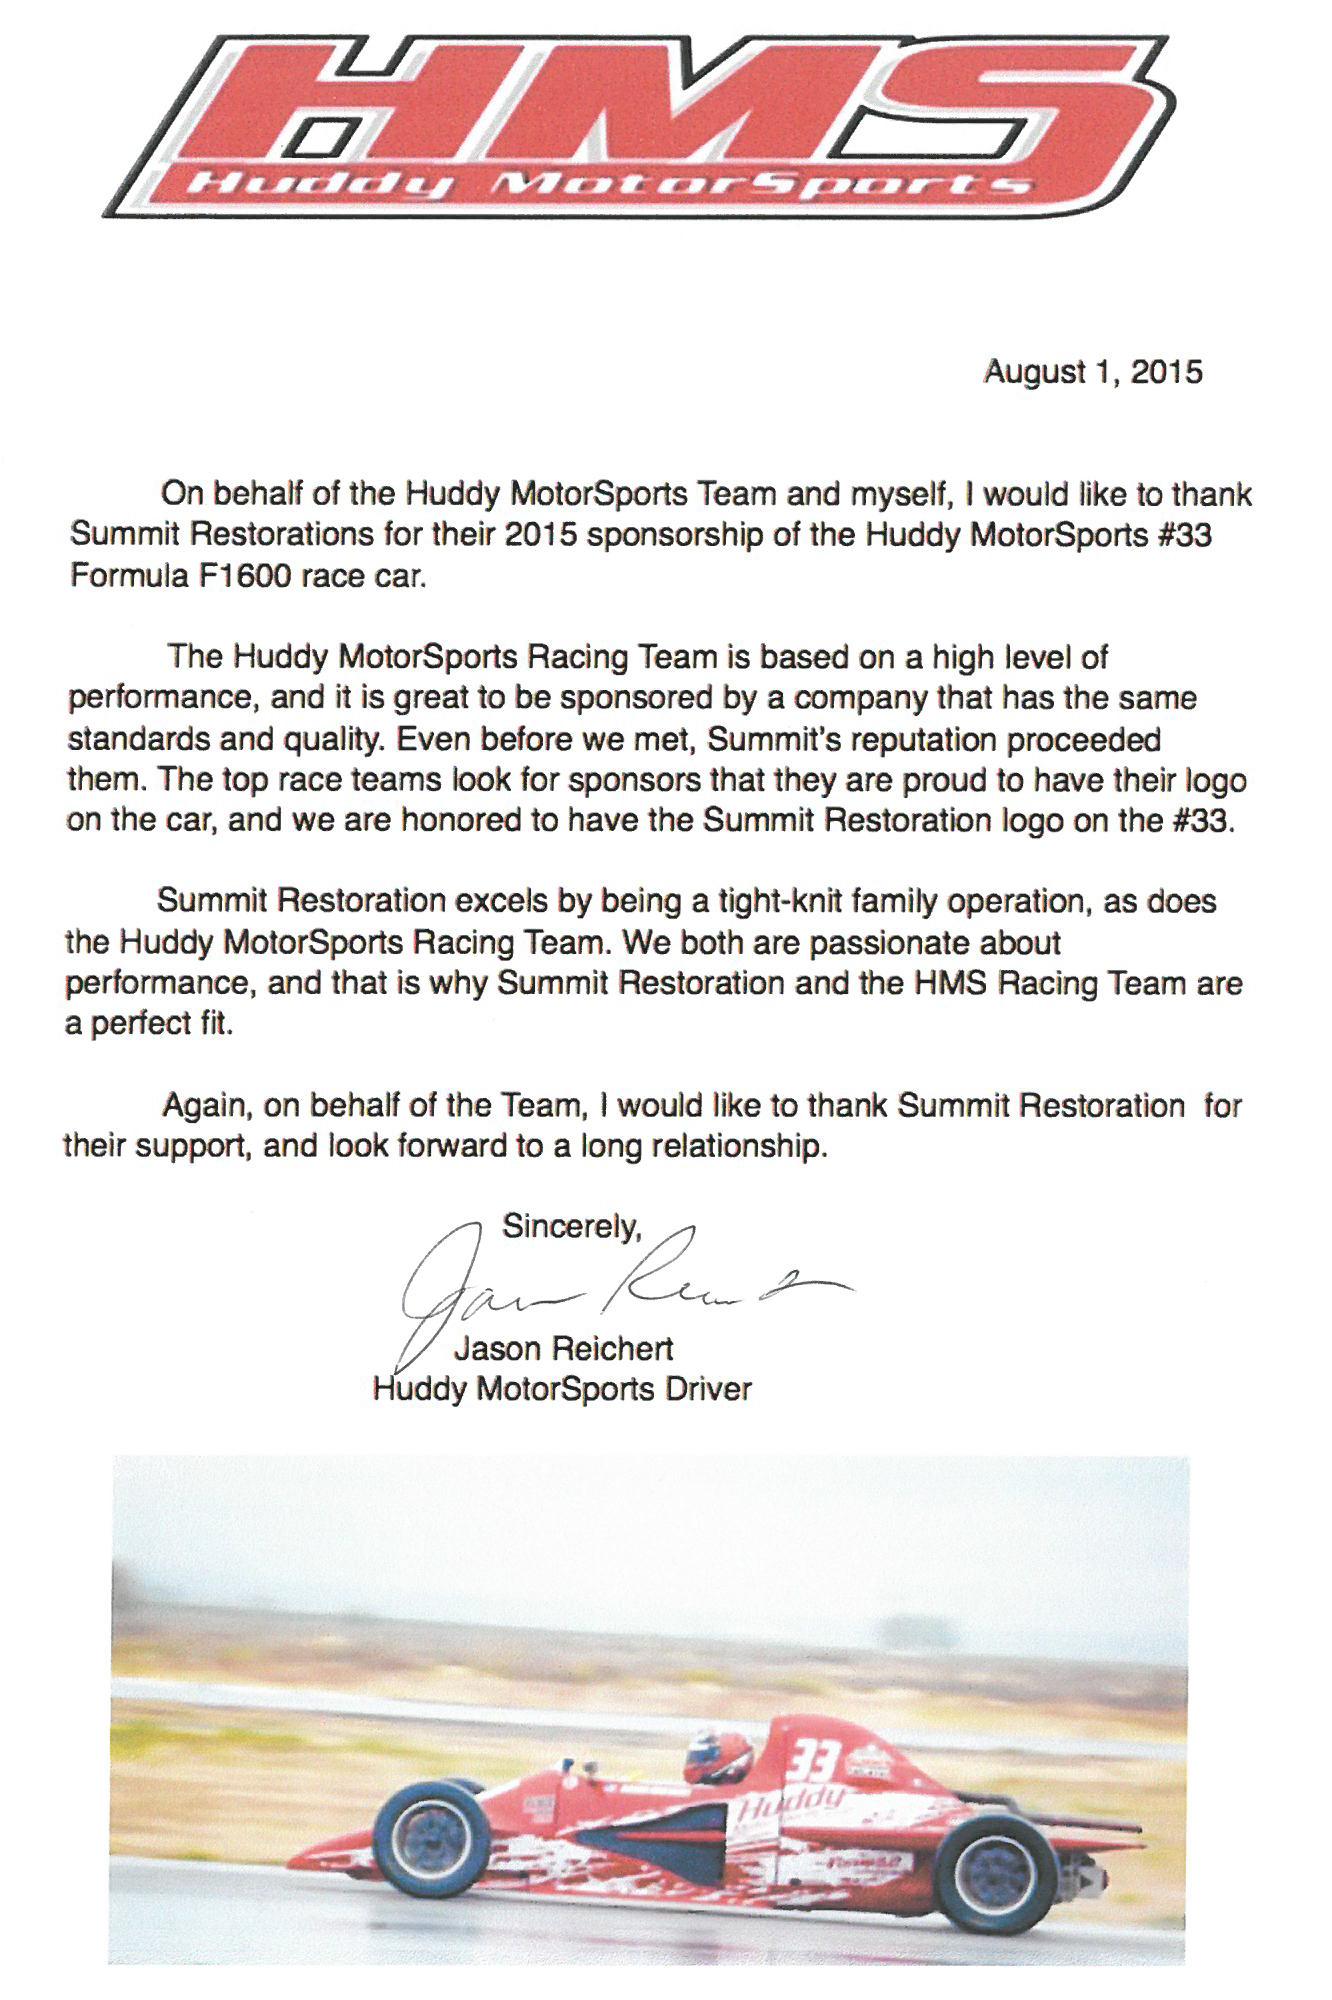 Testimonial from Jason Reichert Huddy MotorSports Driver